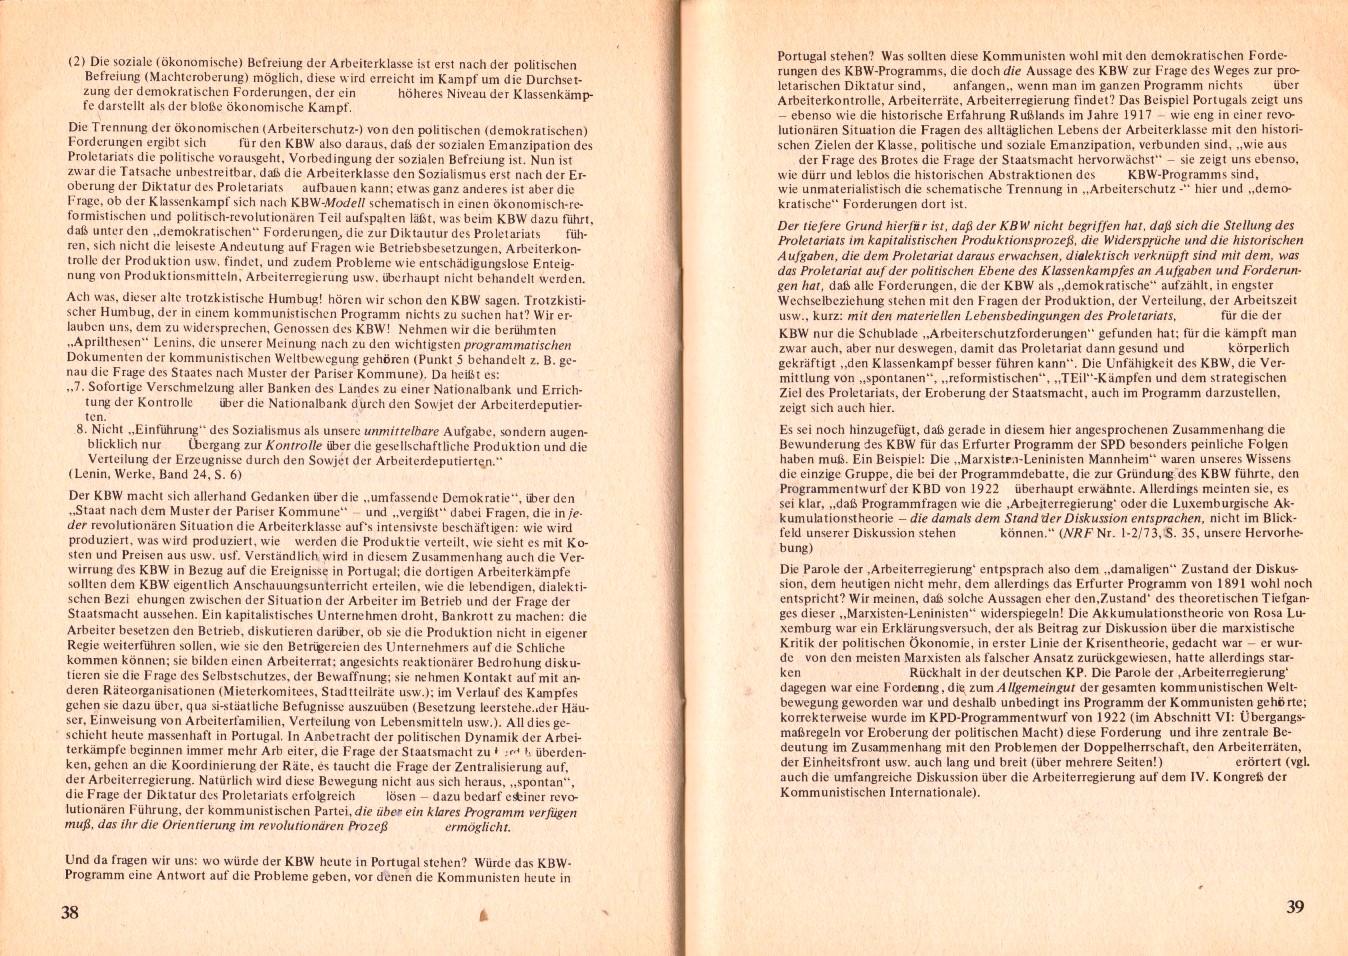 Spartacus_1975_Kritik_des_KBW_21